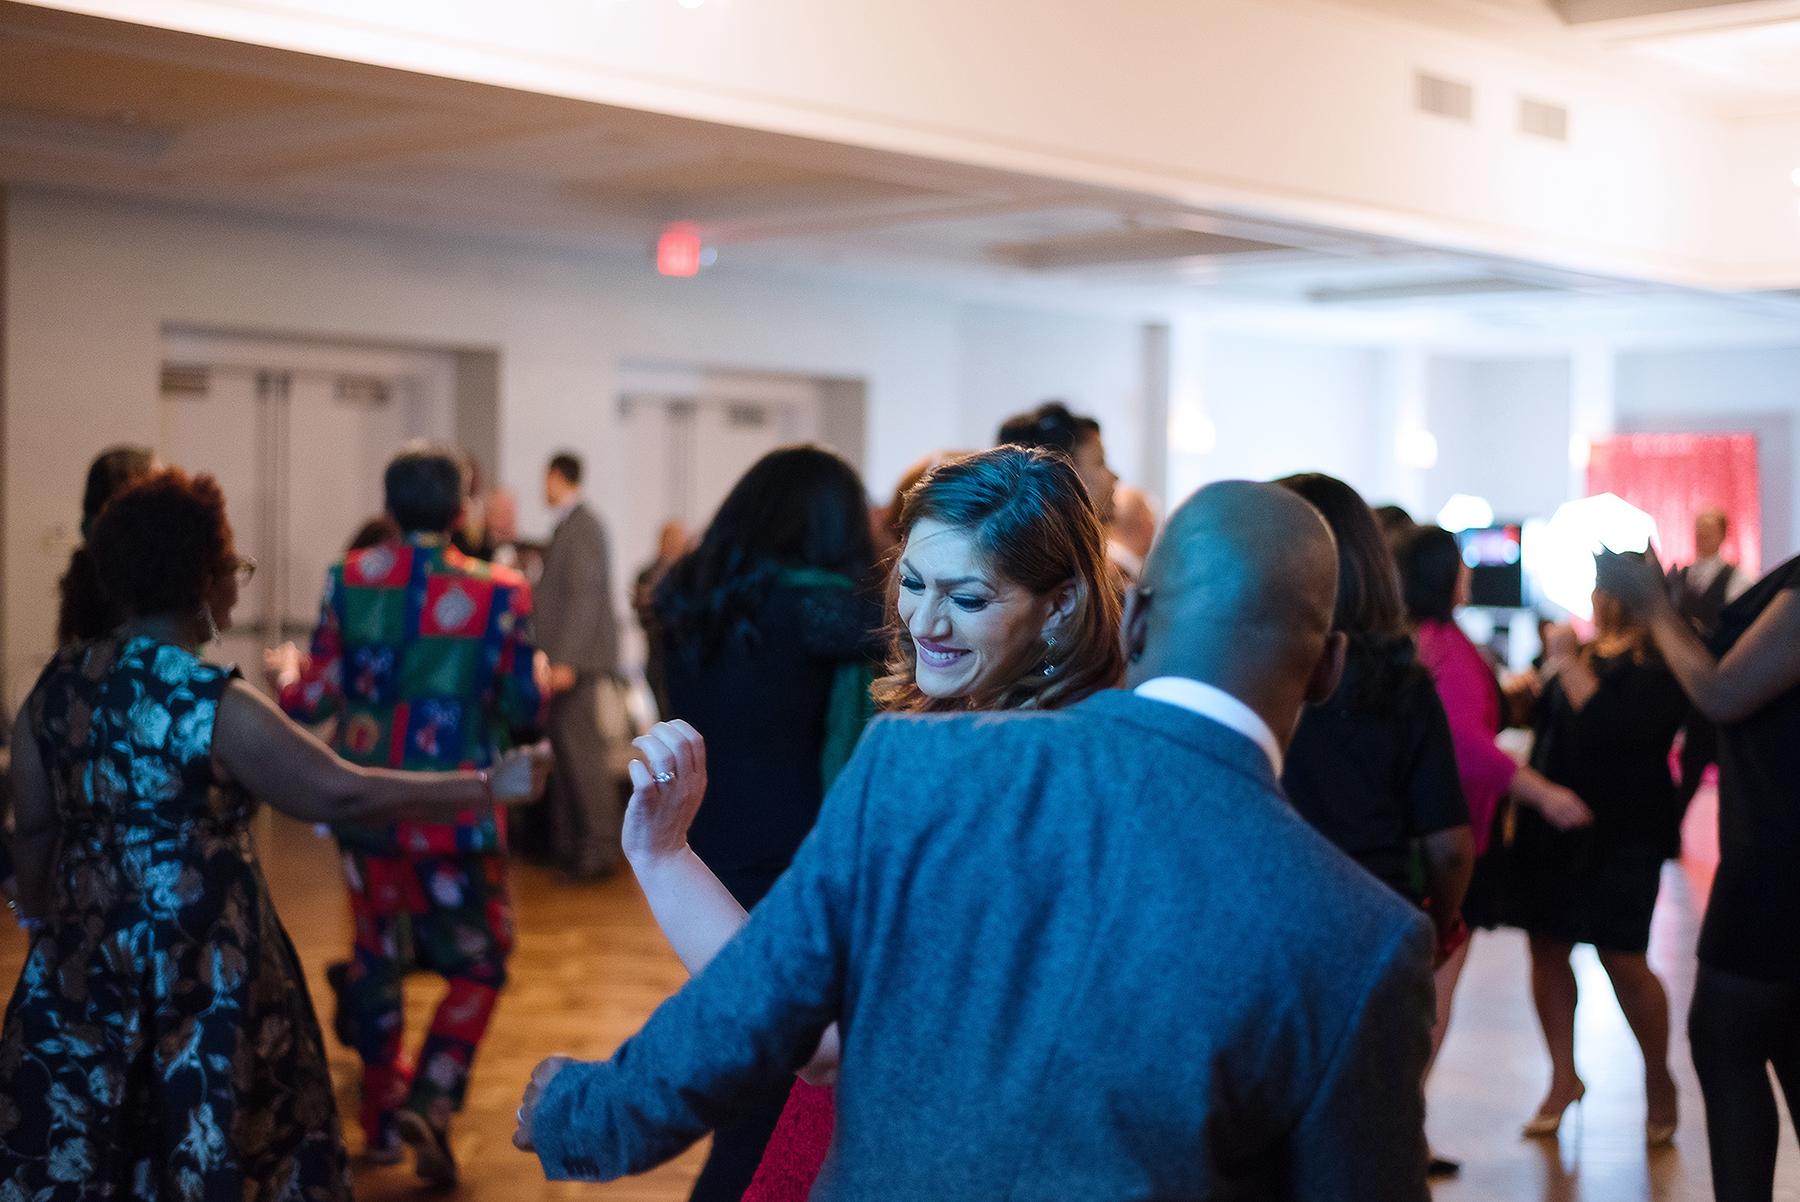 Signal Financial Holiday Party Corporate Washington D.C. Photography23.jpg